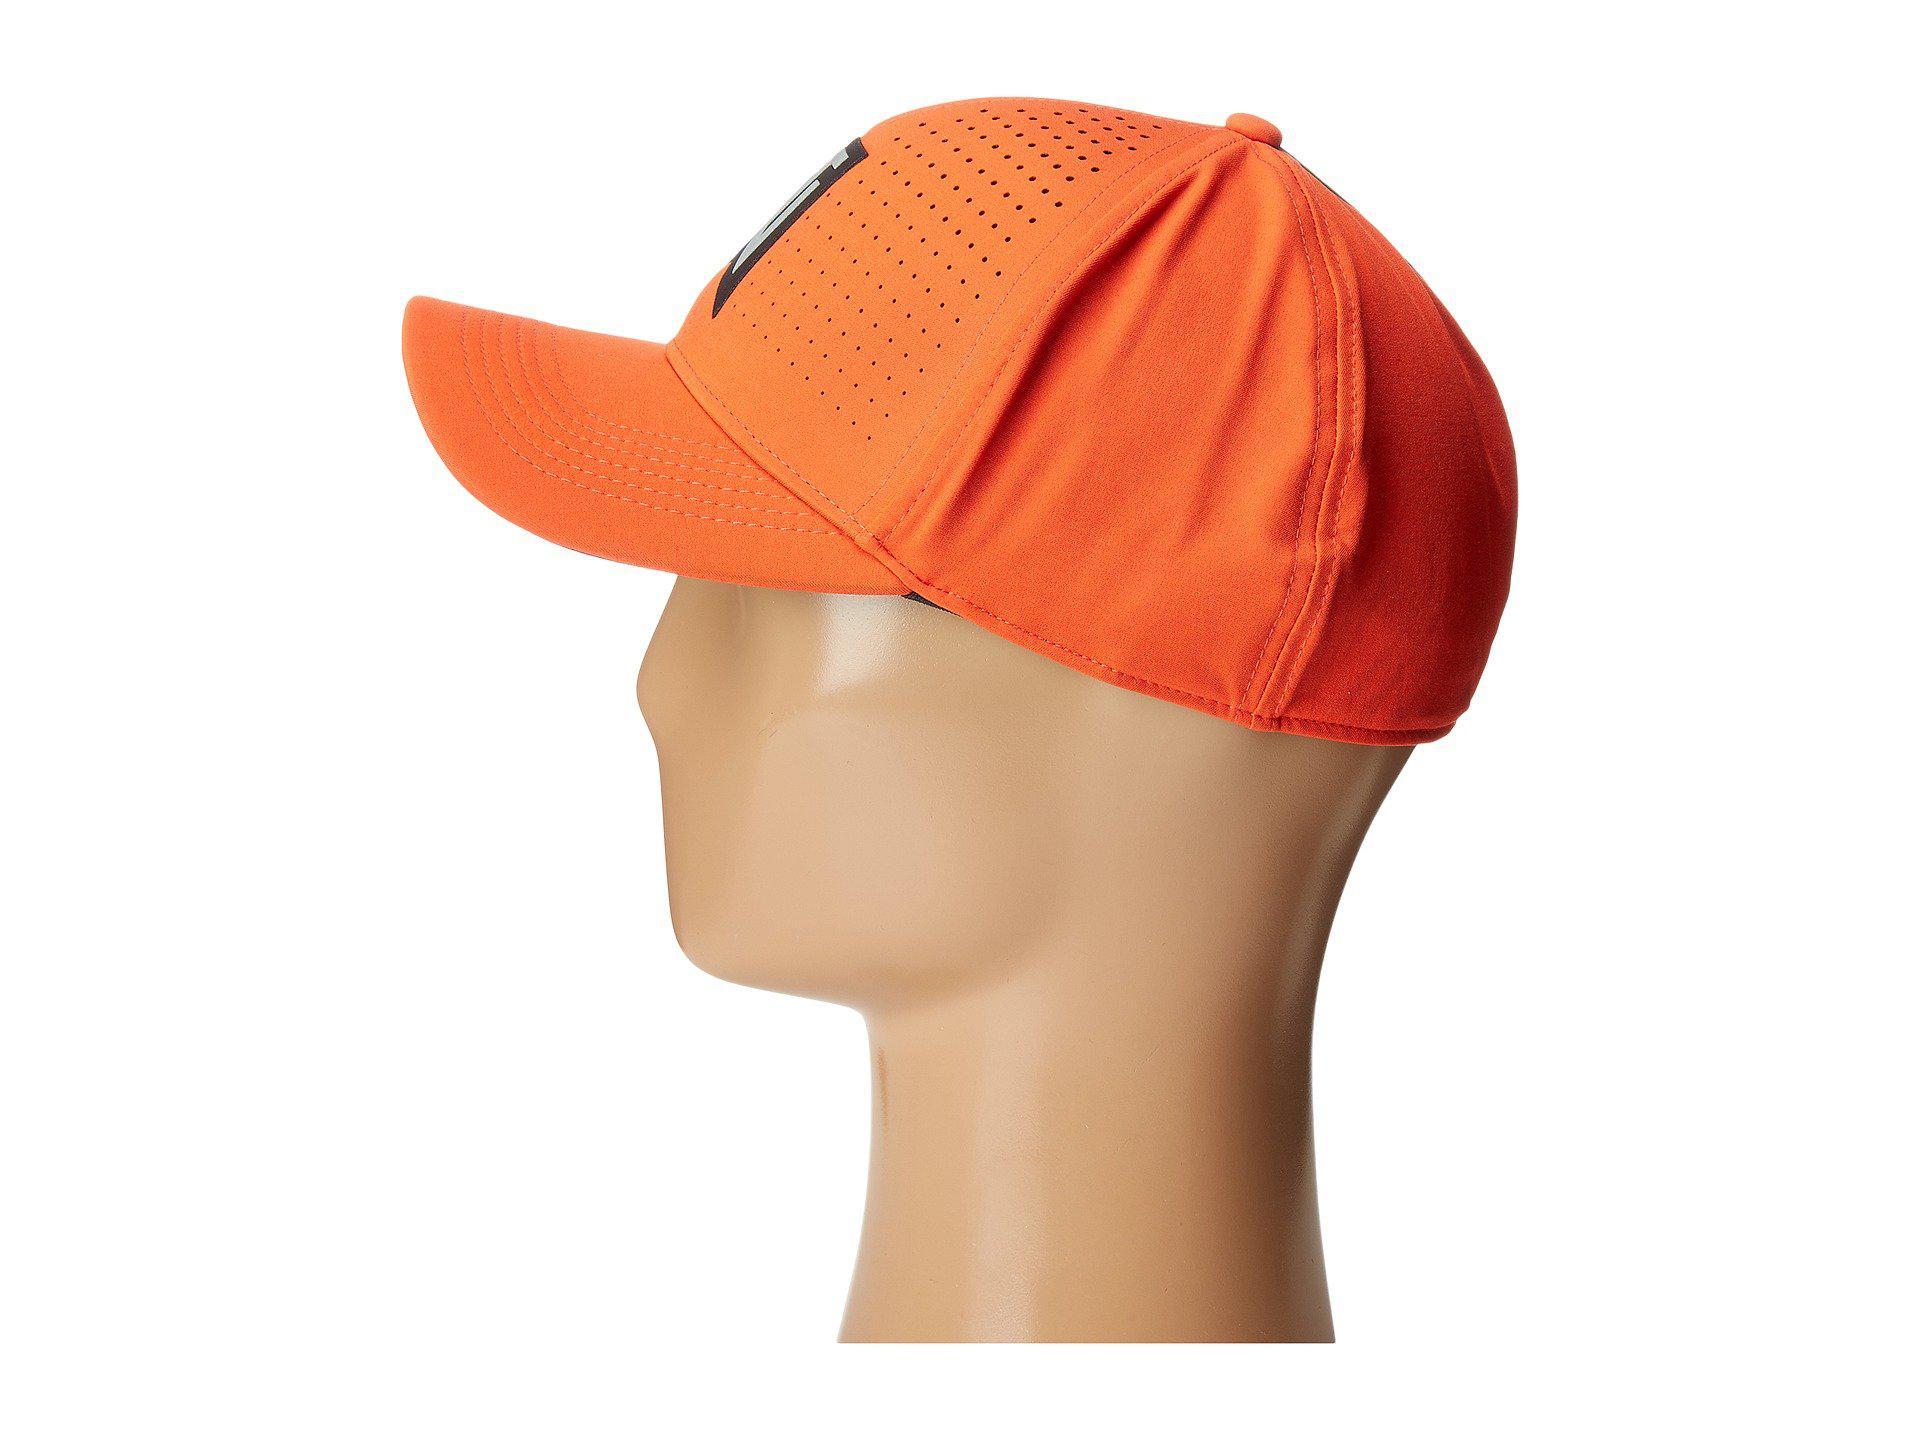 Lyst - Nike Tiger Woods Classic99 Statement Cap in Orange for Men 89c85f66baf